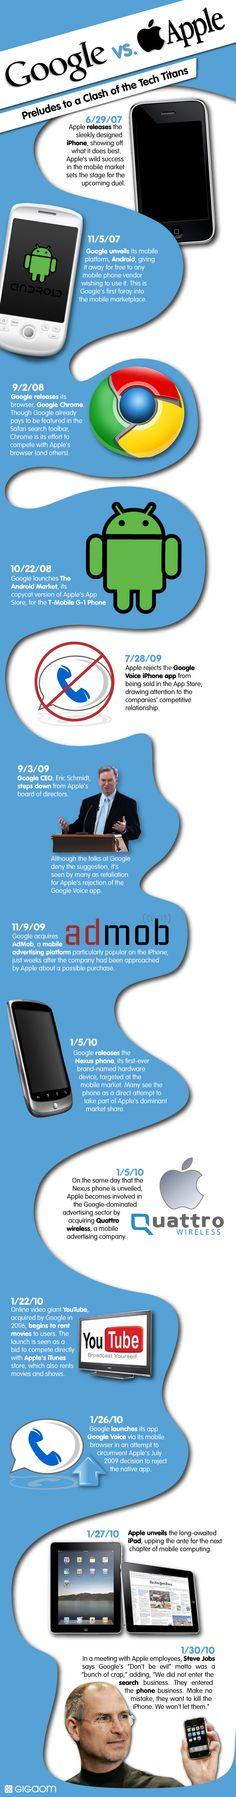 Google vs Apple: The Mobile War #infographic